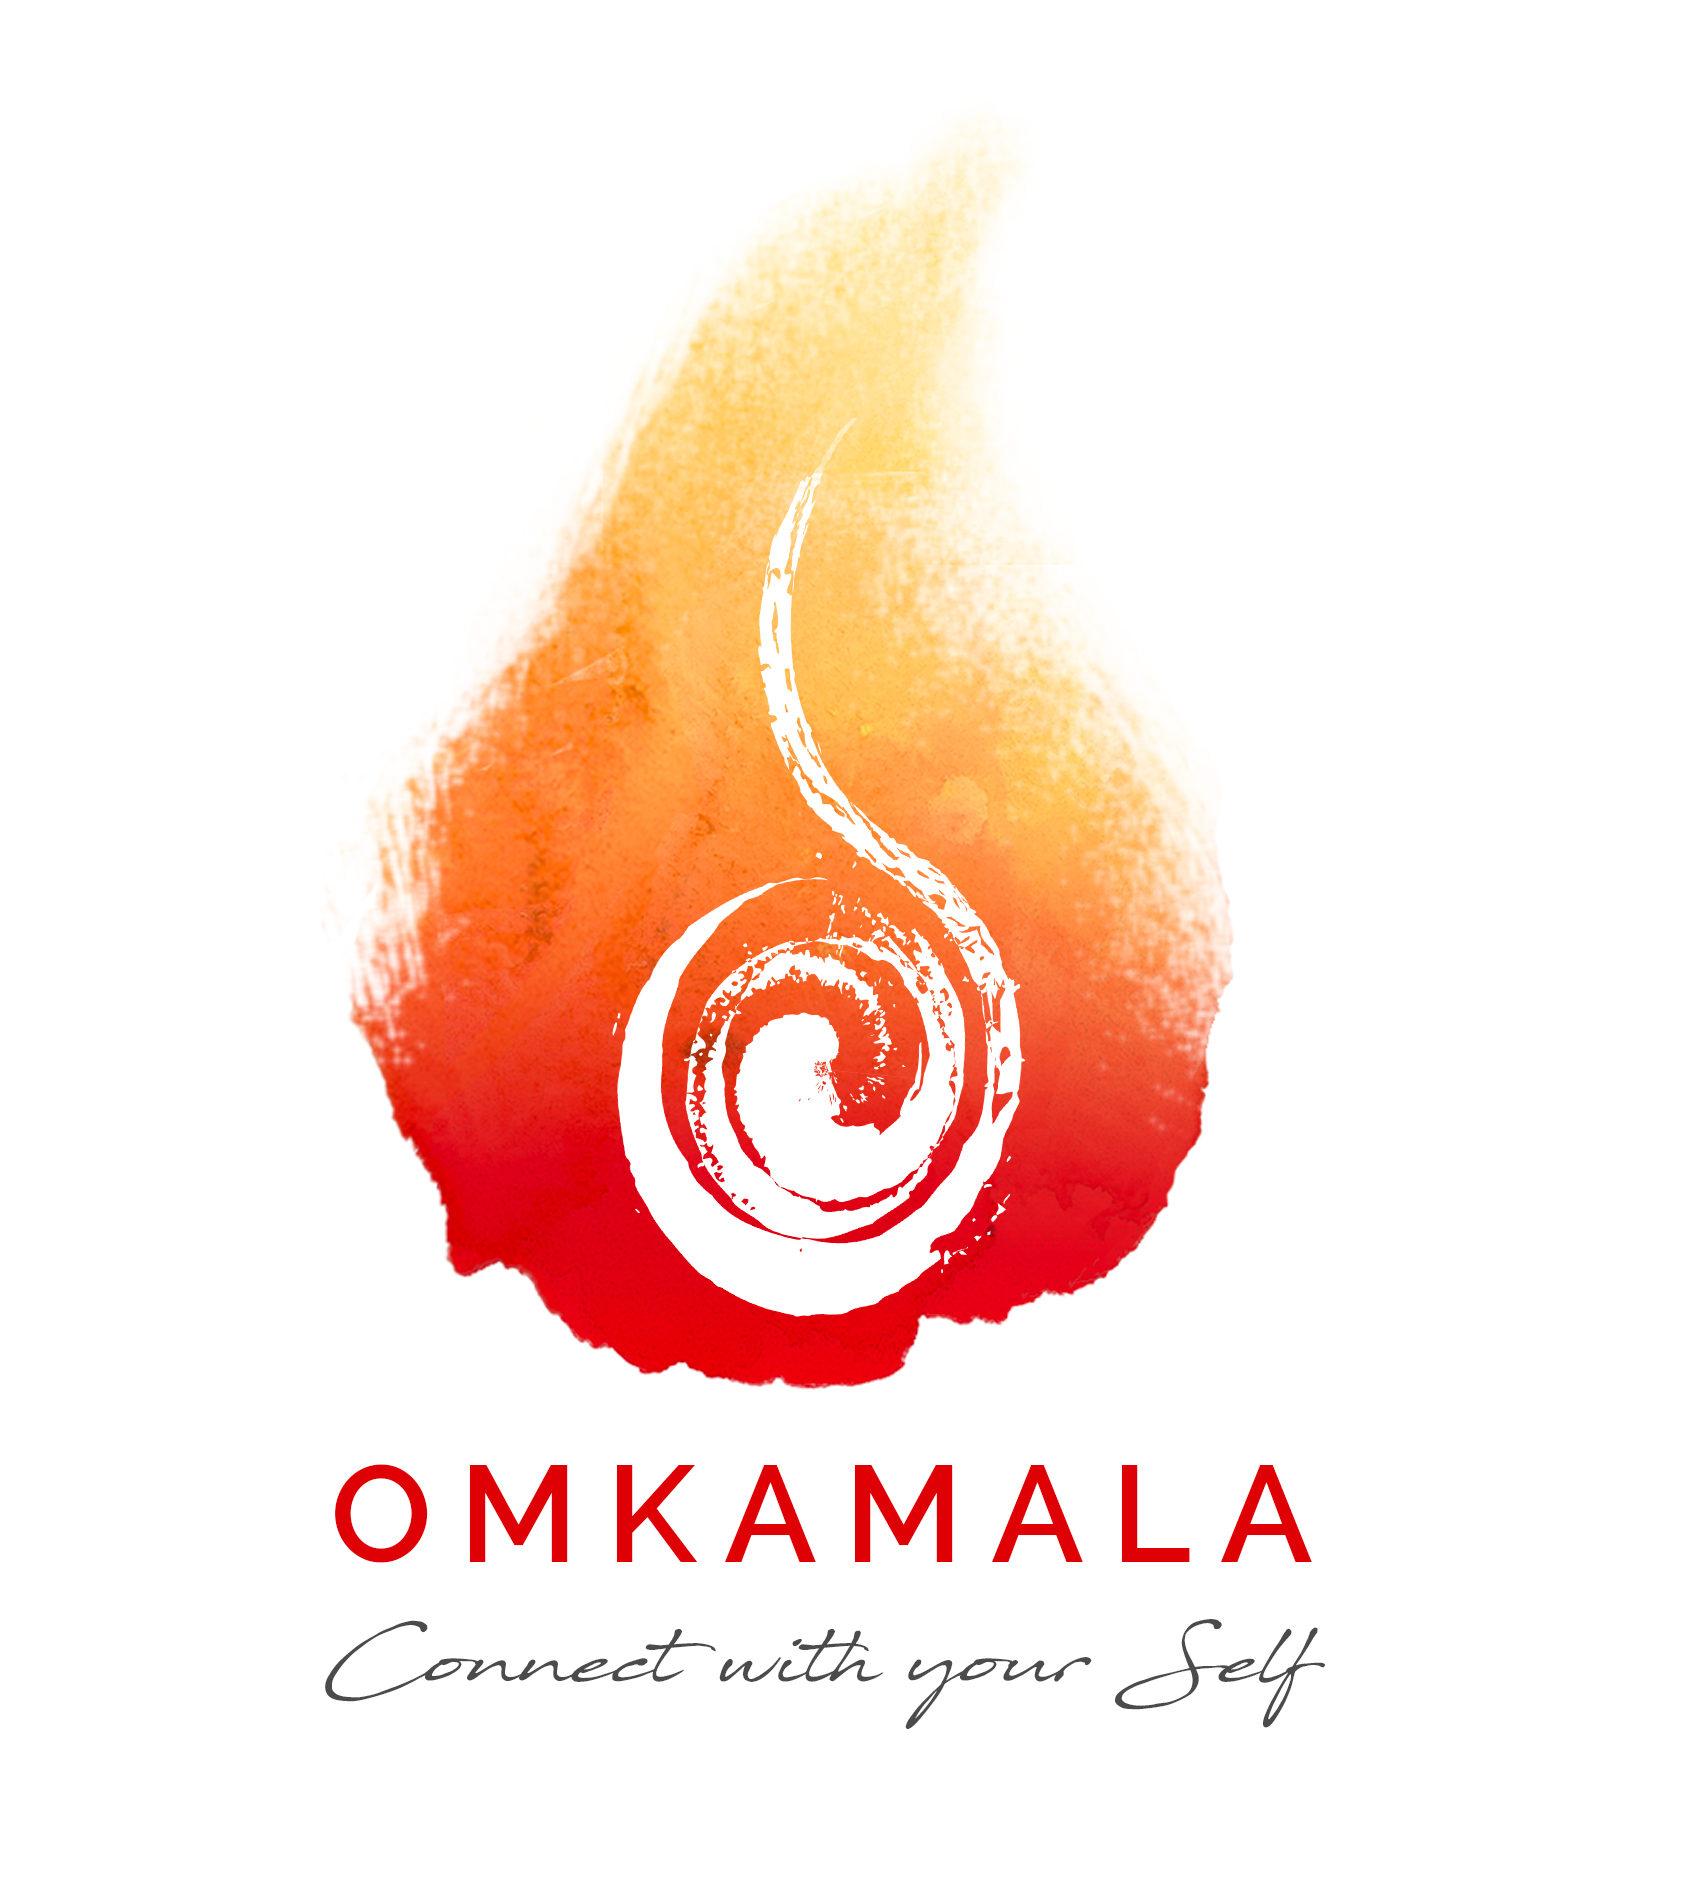 OmKamala